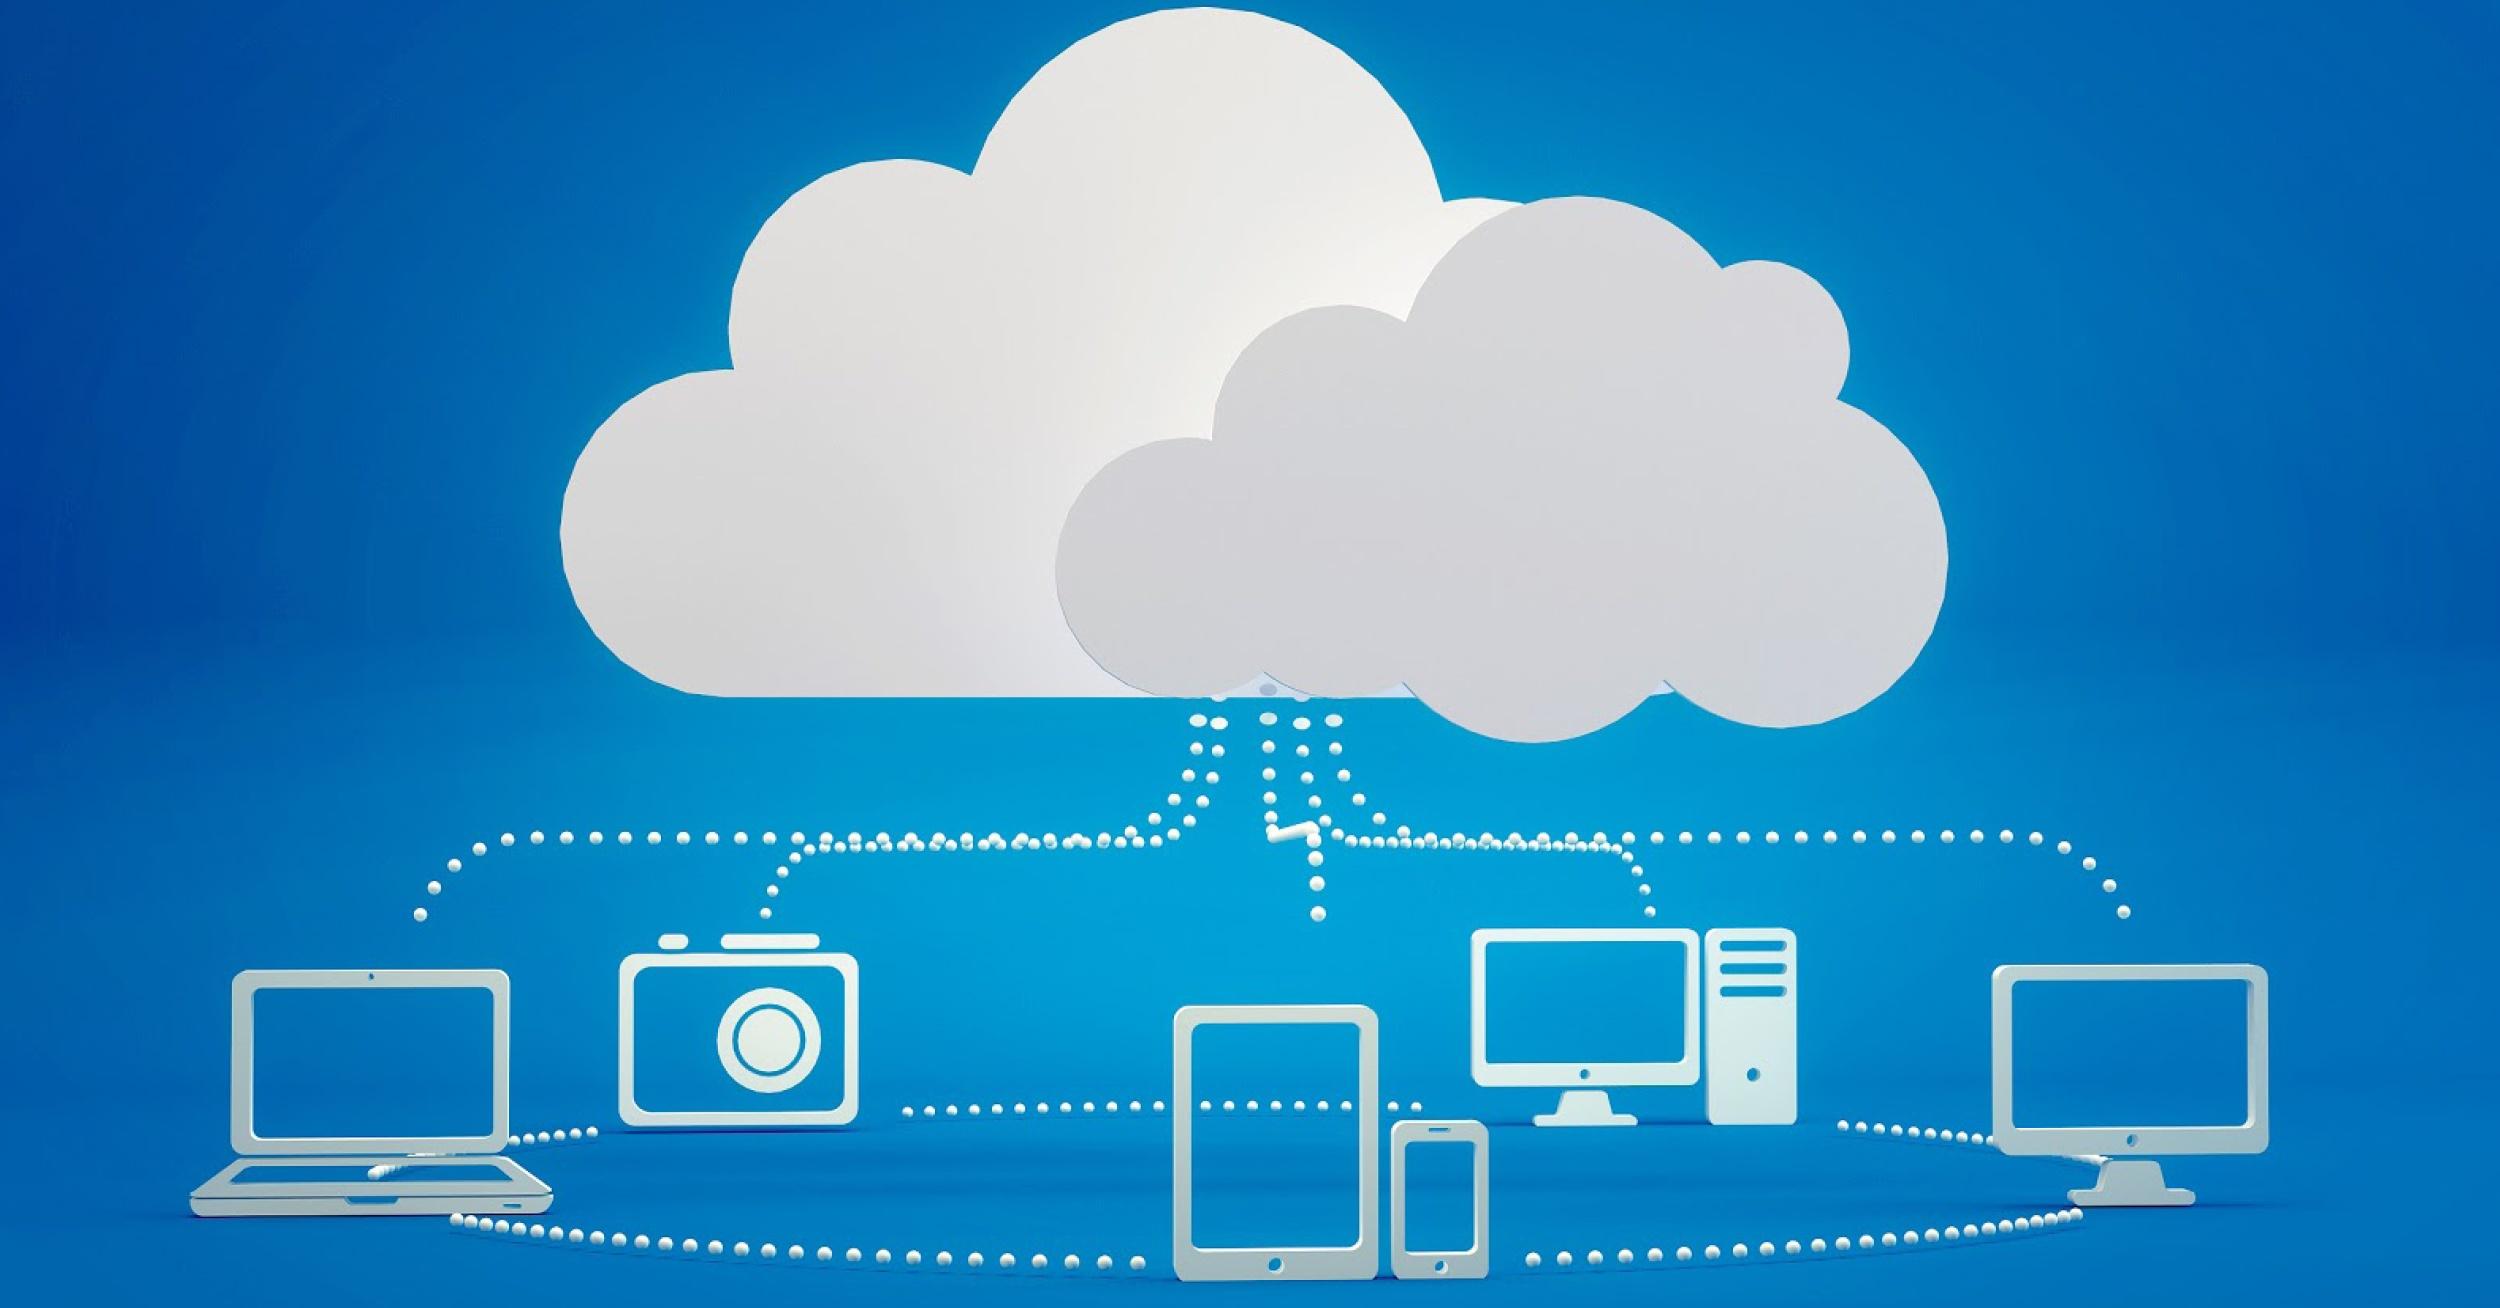 EMS software using cloud technology